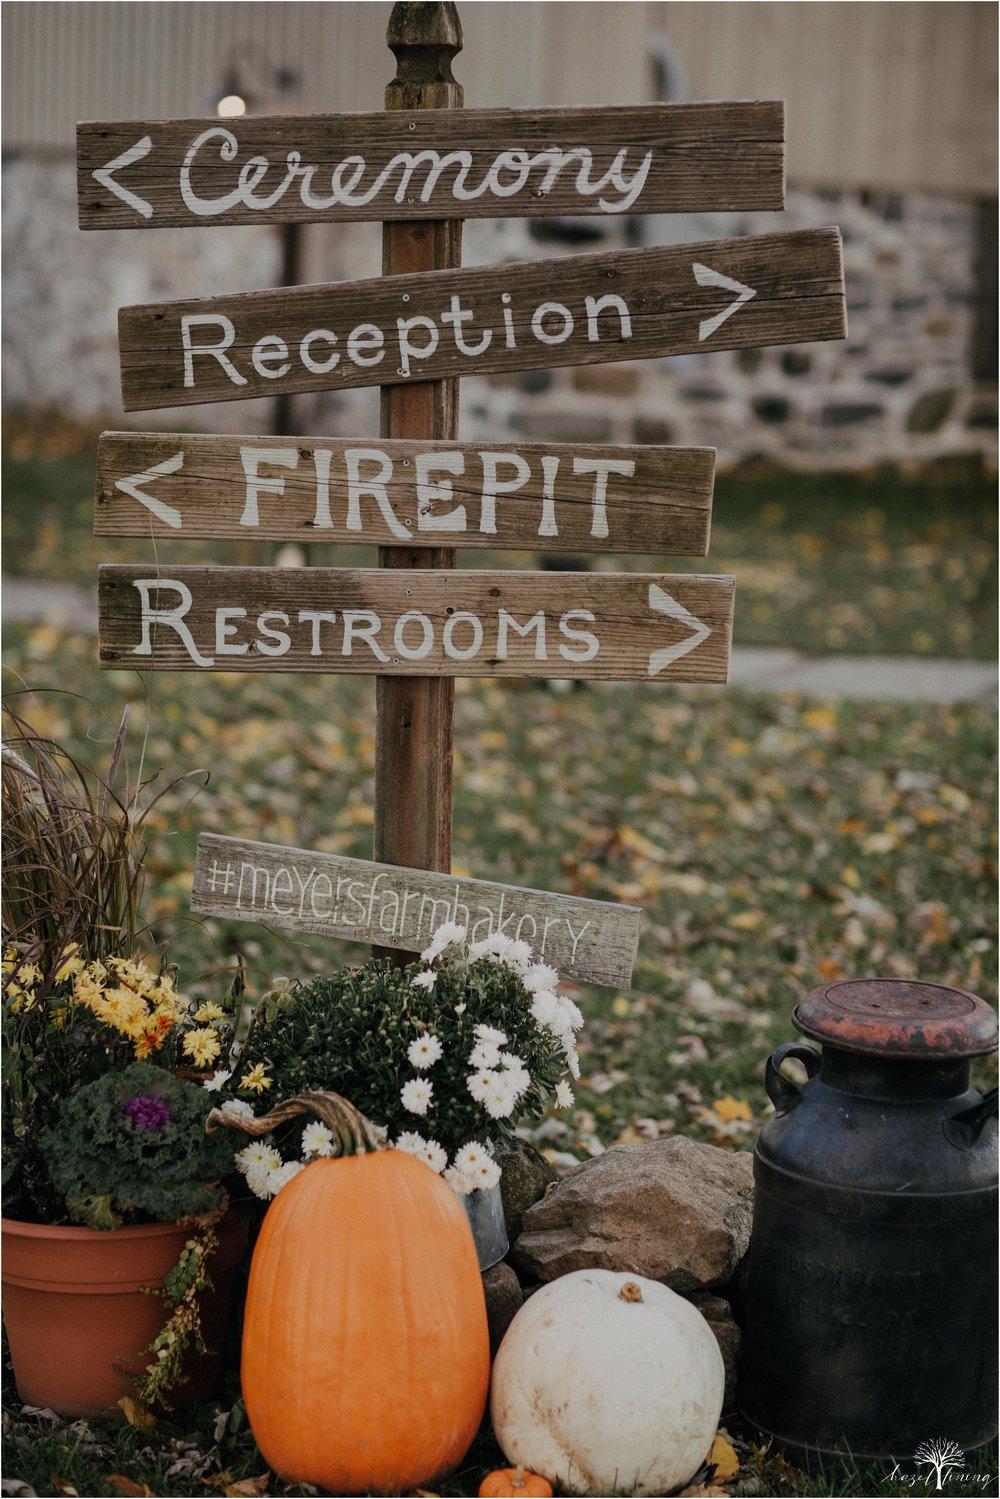 briana-krans-greg-johnston-farm-bakery-and-events-fall-wedding_0086.jpg